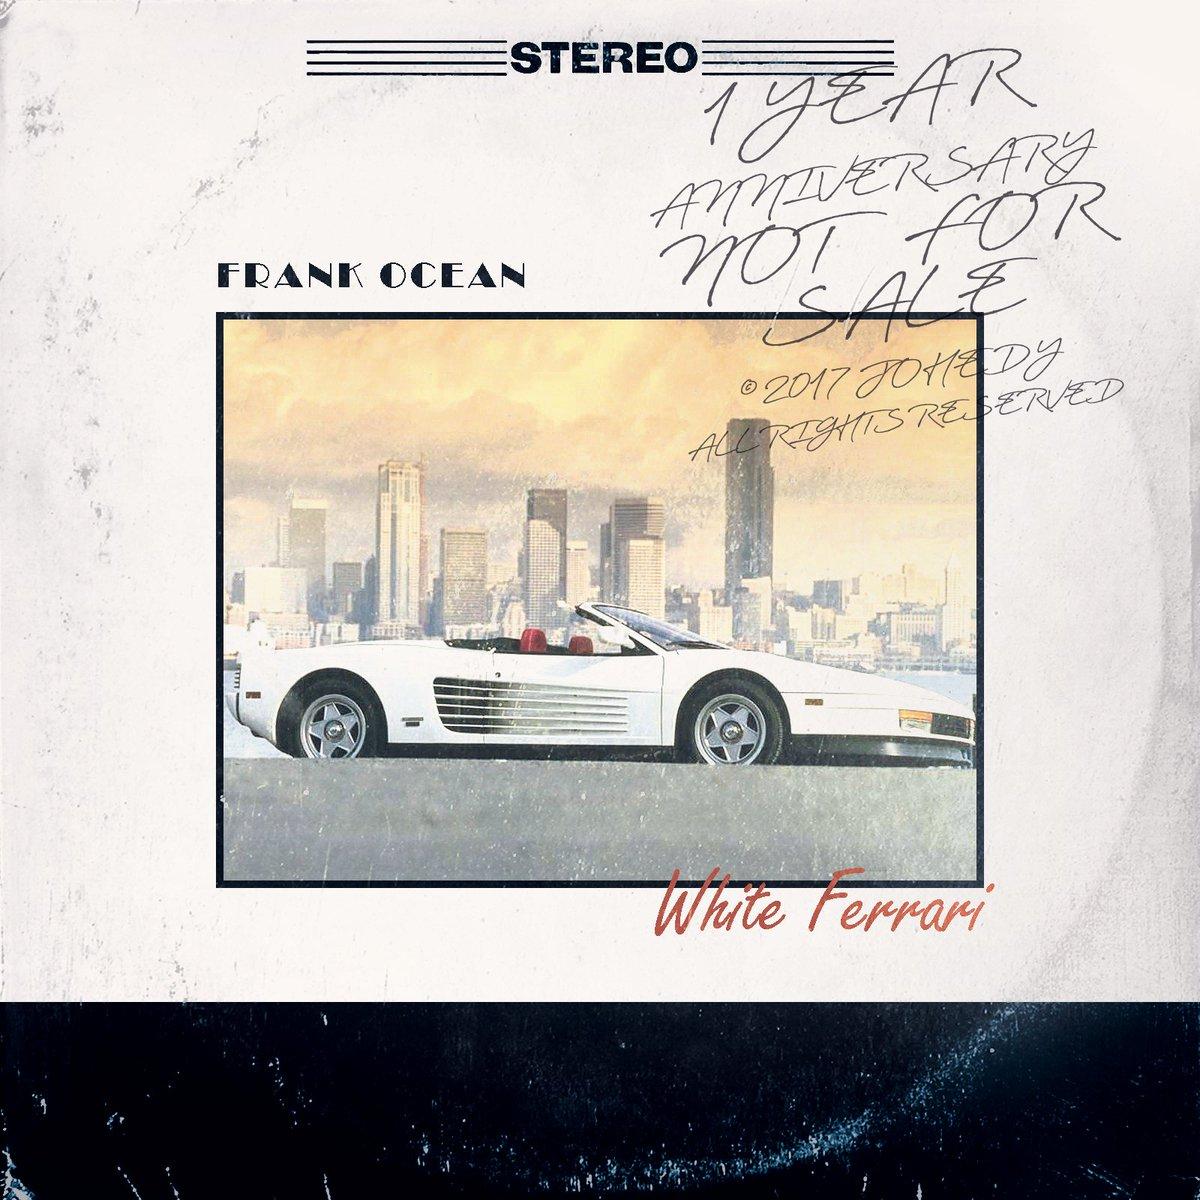 On Twitter 1 Year Later Frank Ocean White Ferrari Alternative Artwork Vinyl Edition Made By Yours Truly Blonde Frankocean Whiteferrari Https T Co Cb3pvwpxnz